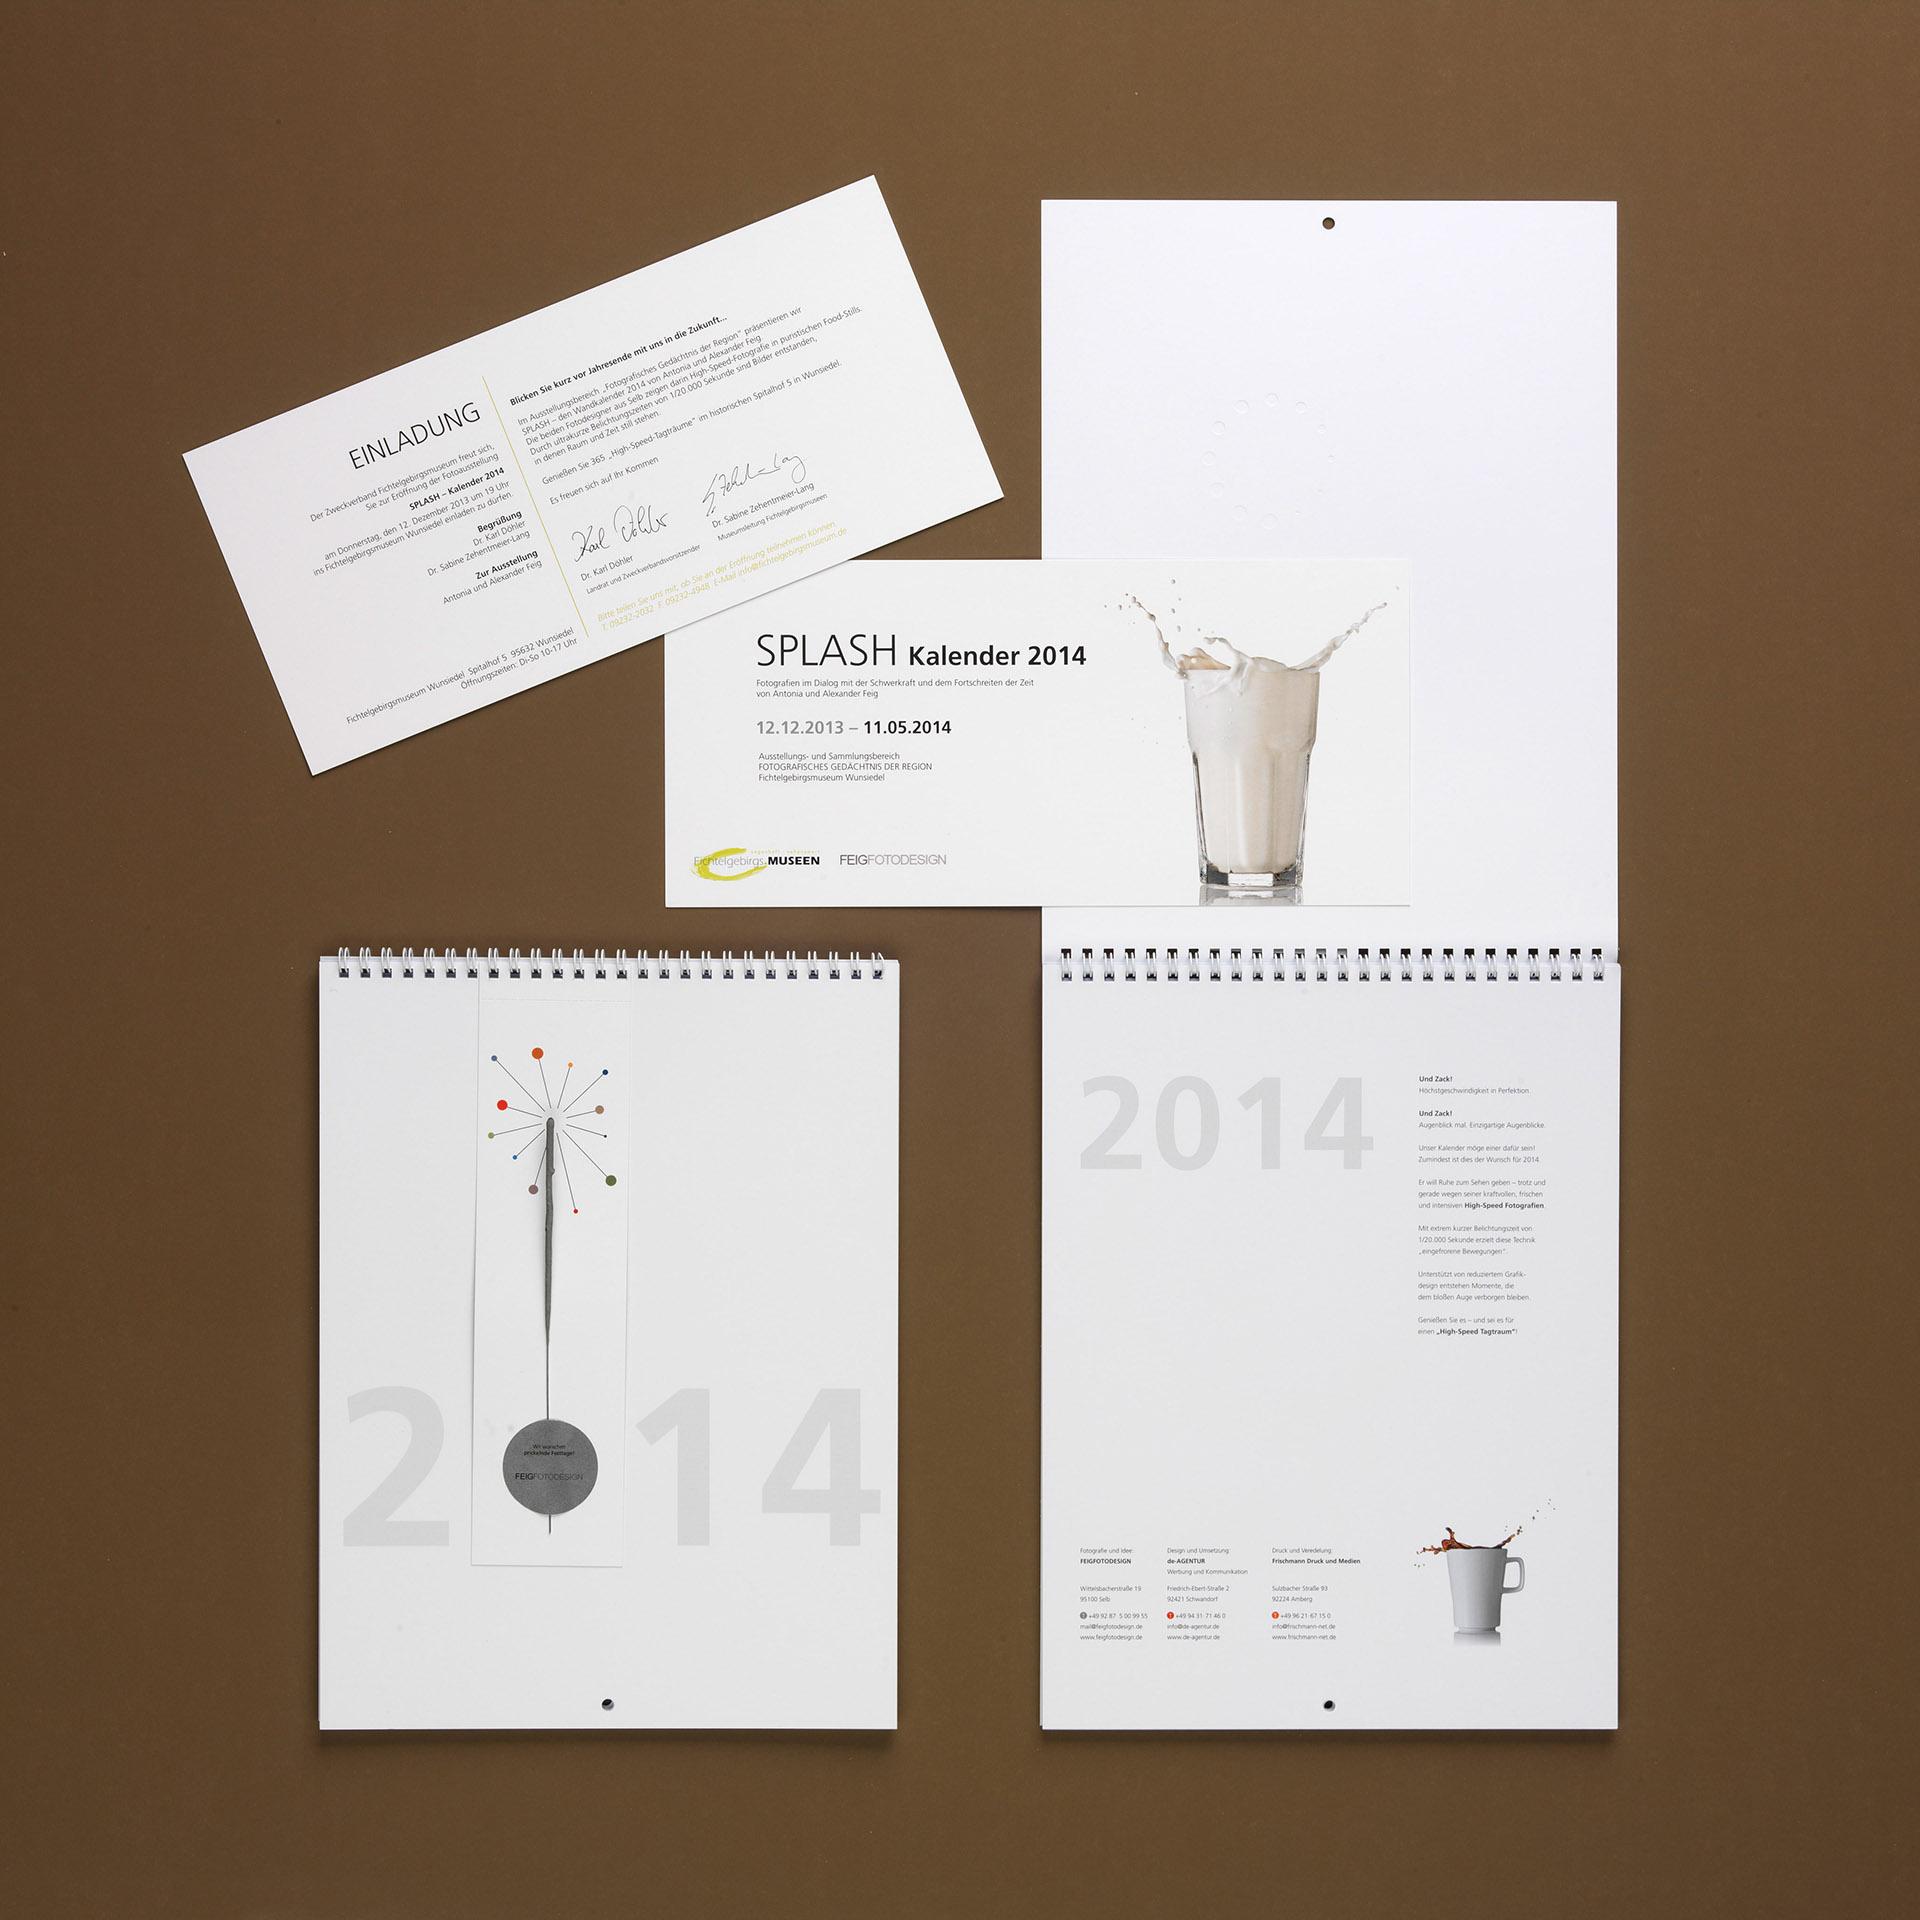 german design award special mention